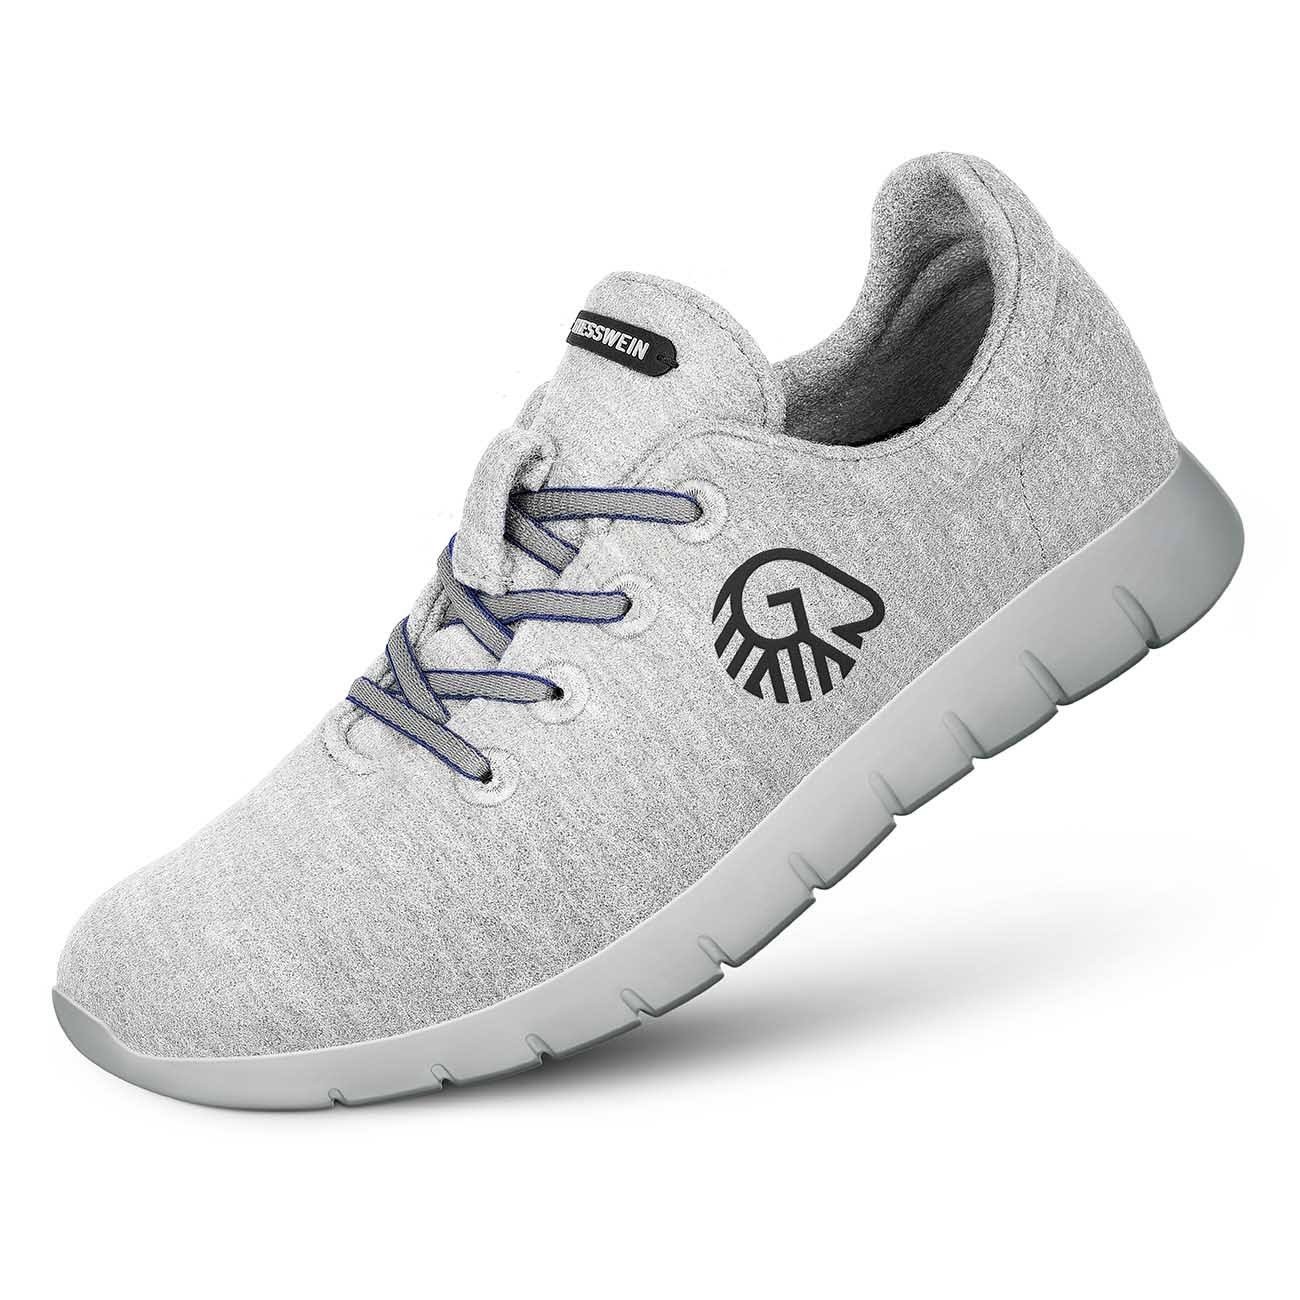 Sneaker Op Giesswein maat48 Wol Merino Runner lichtgrijs Heren vyn0mwN8PO